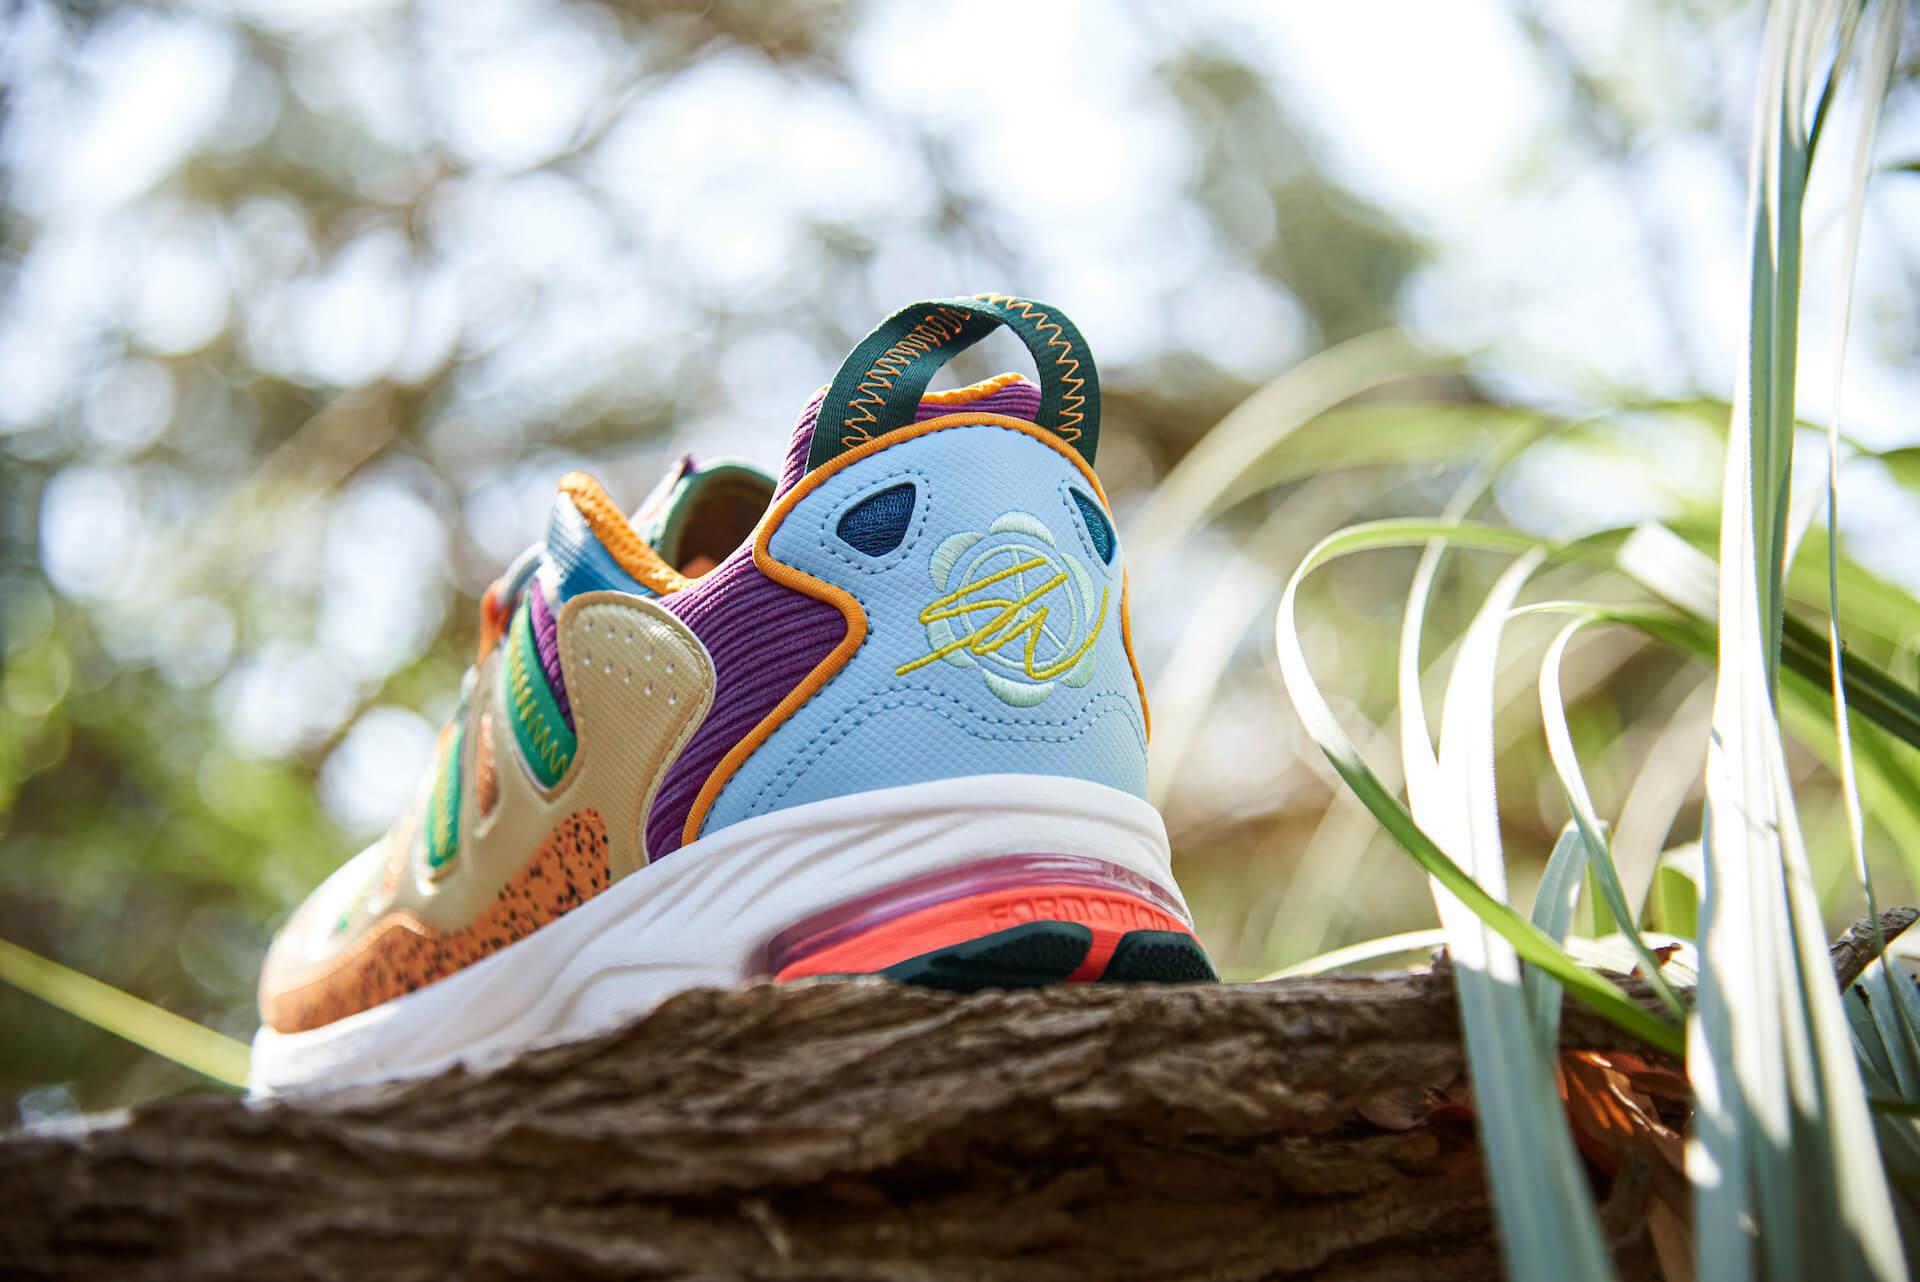 adidas Originalsとショーン・ウェザースプーンの新コラボコレクション「SW SUPERTURF ADVENTURE」が登場! life210921_adidas_sw_2